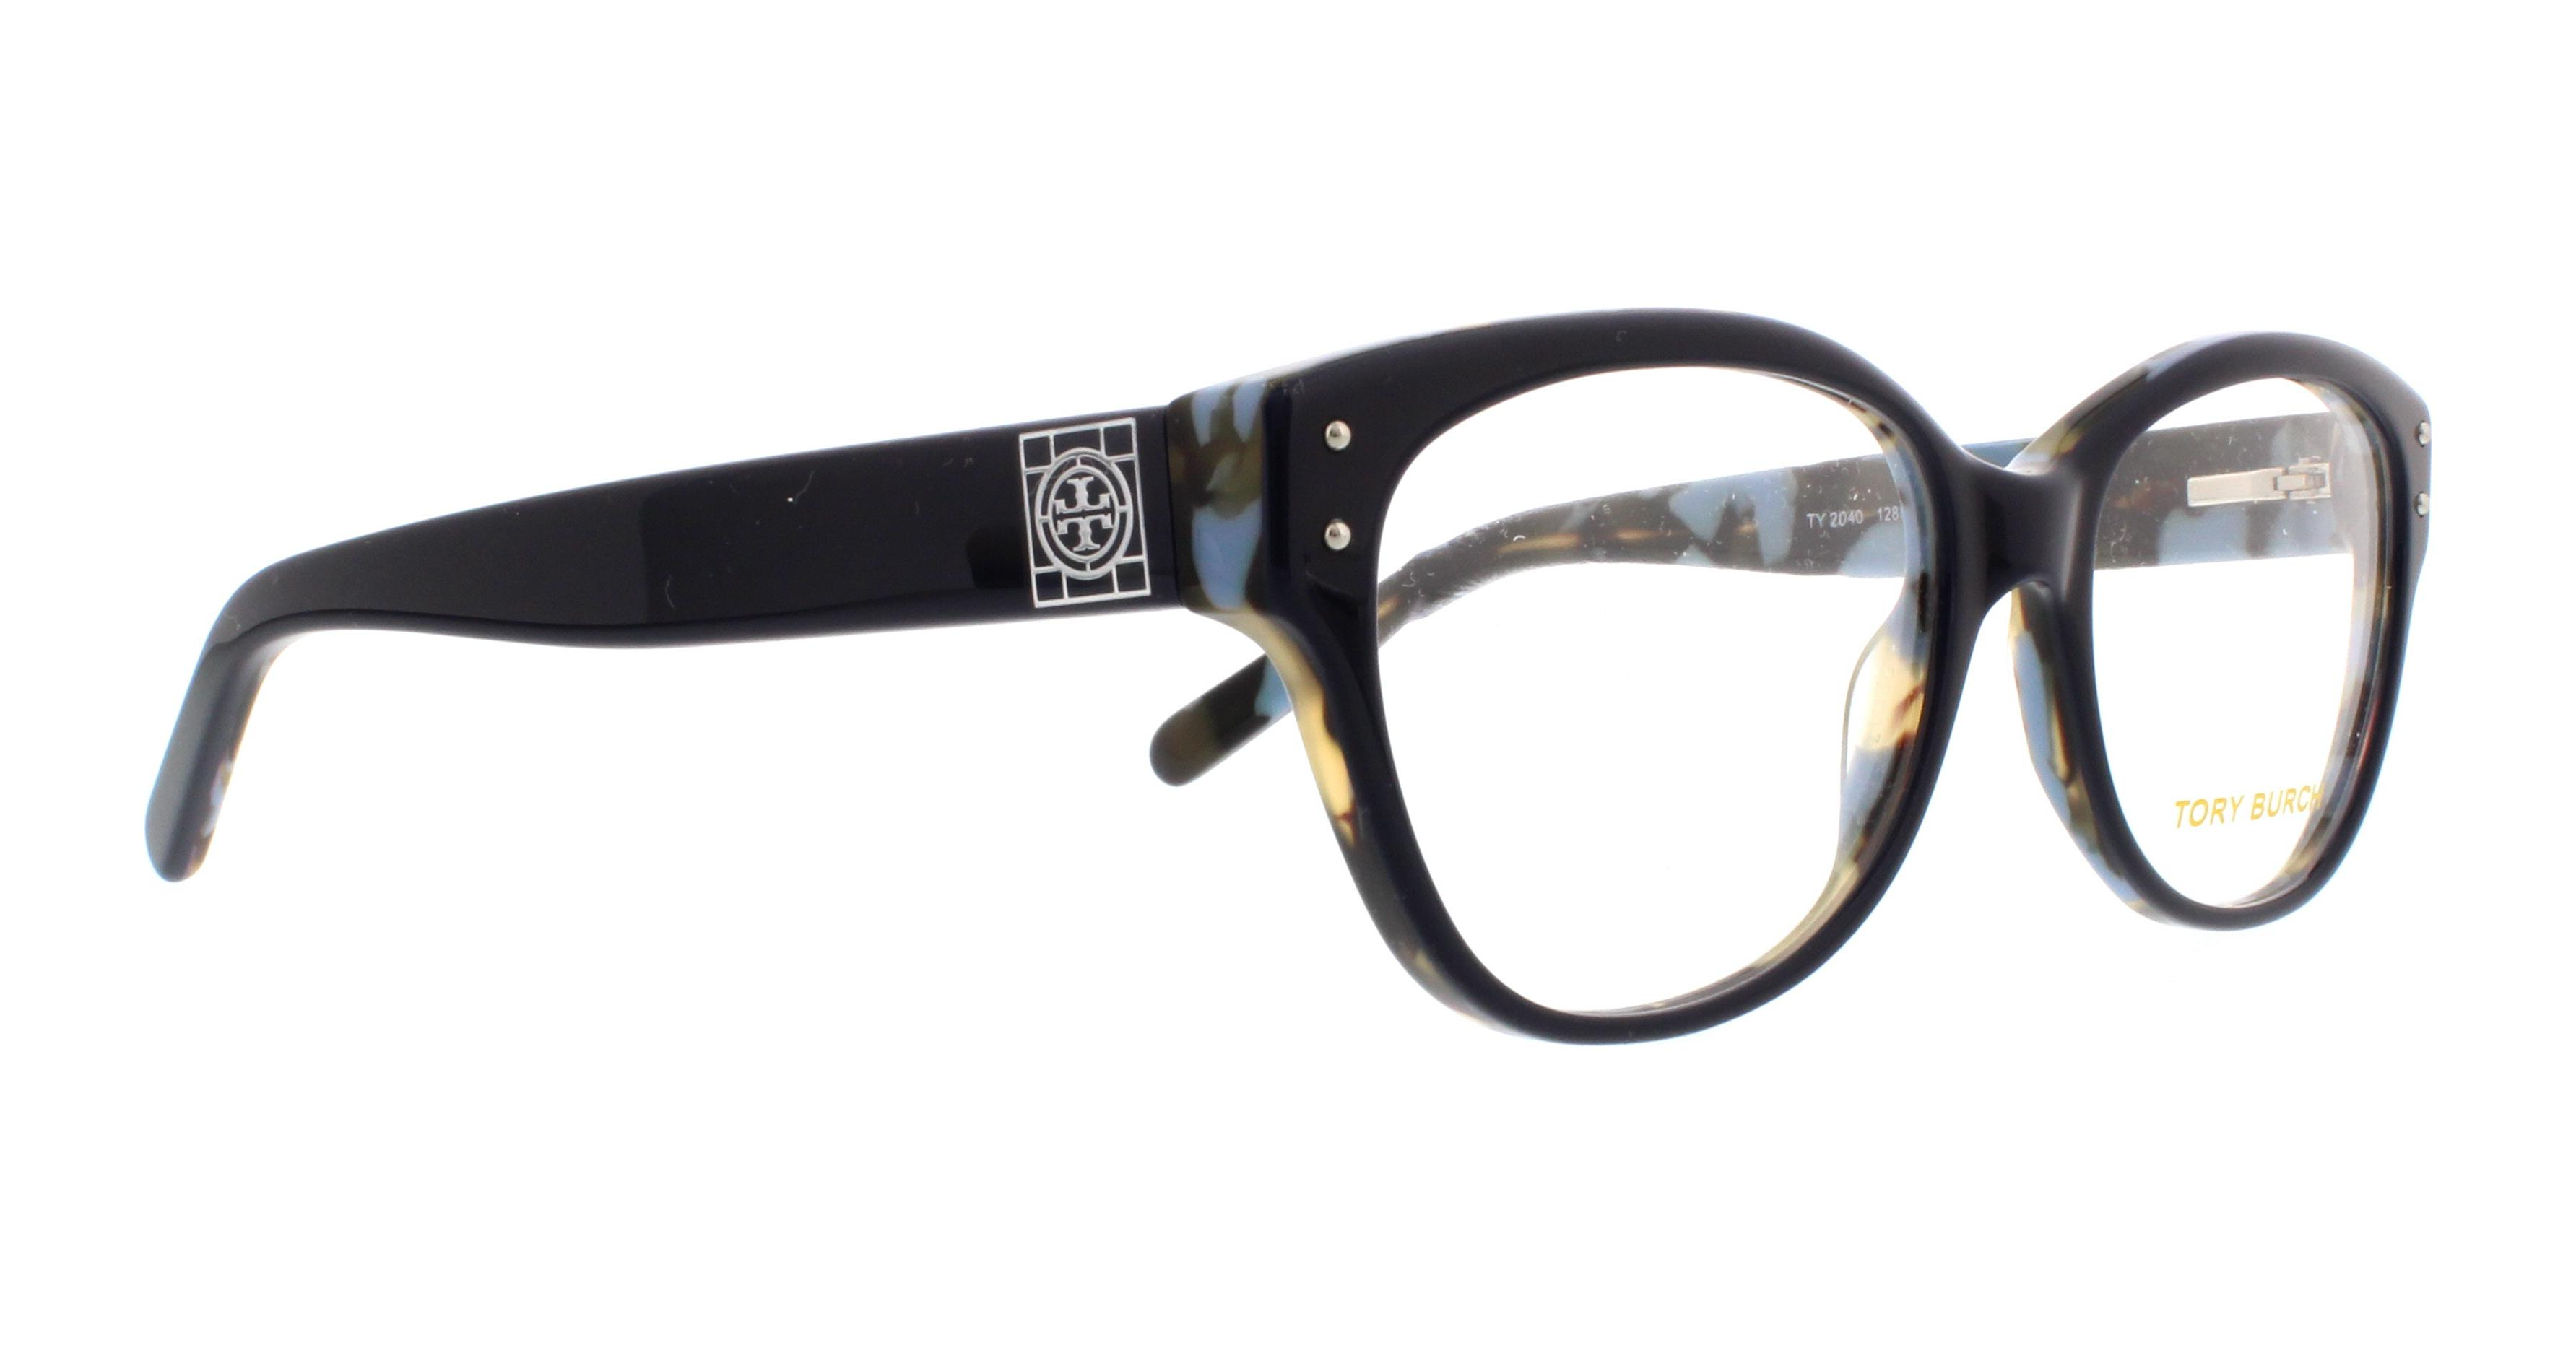 53372784a1 Tory Burch Reading Glasses - Best Glasses Cnapracticetesting.Com 2018